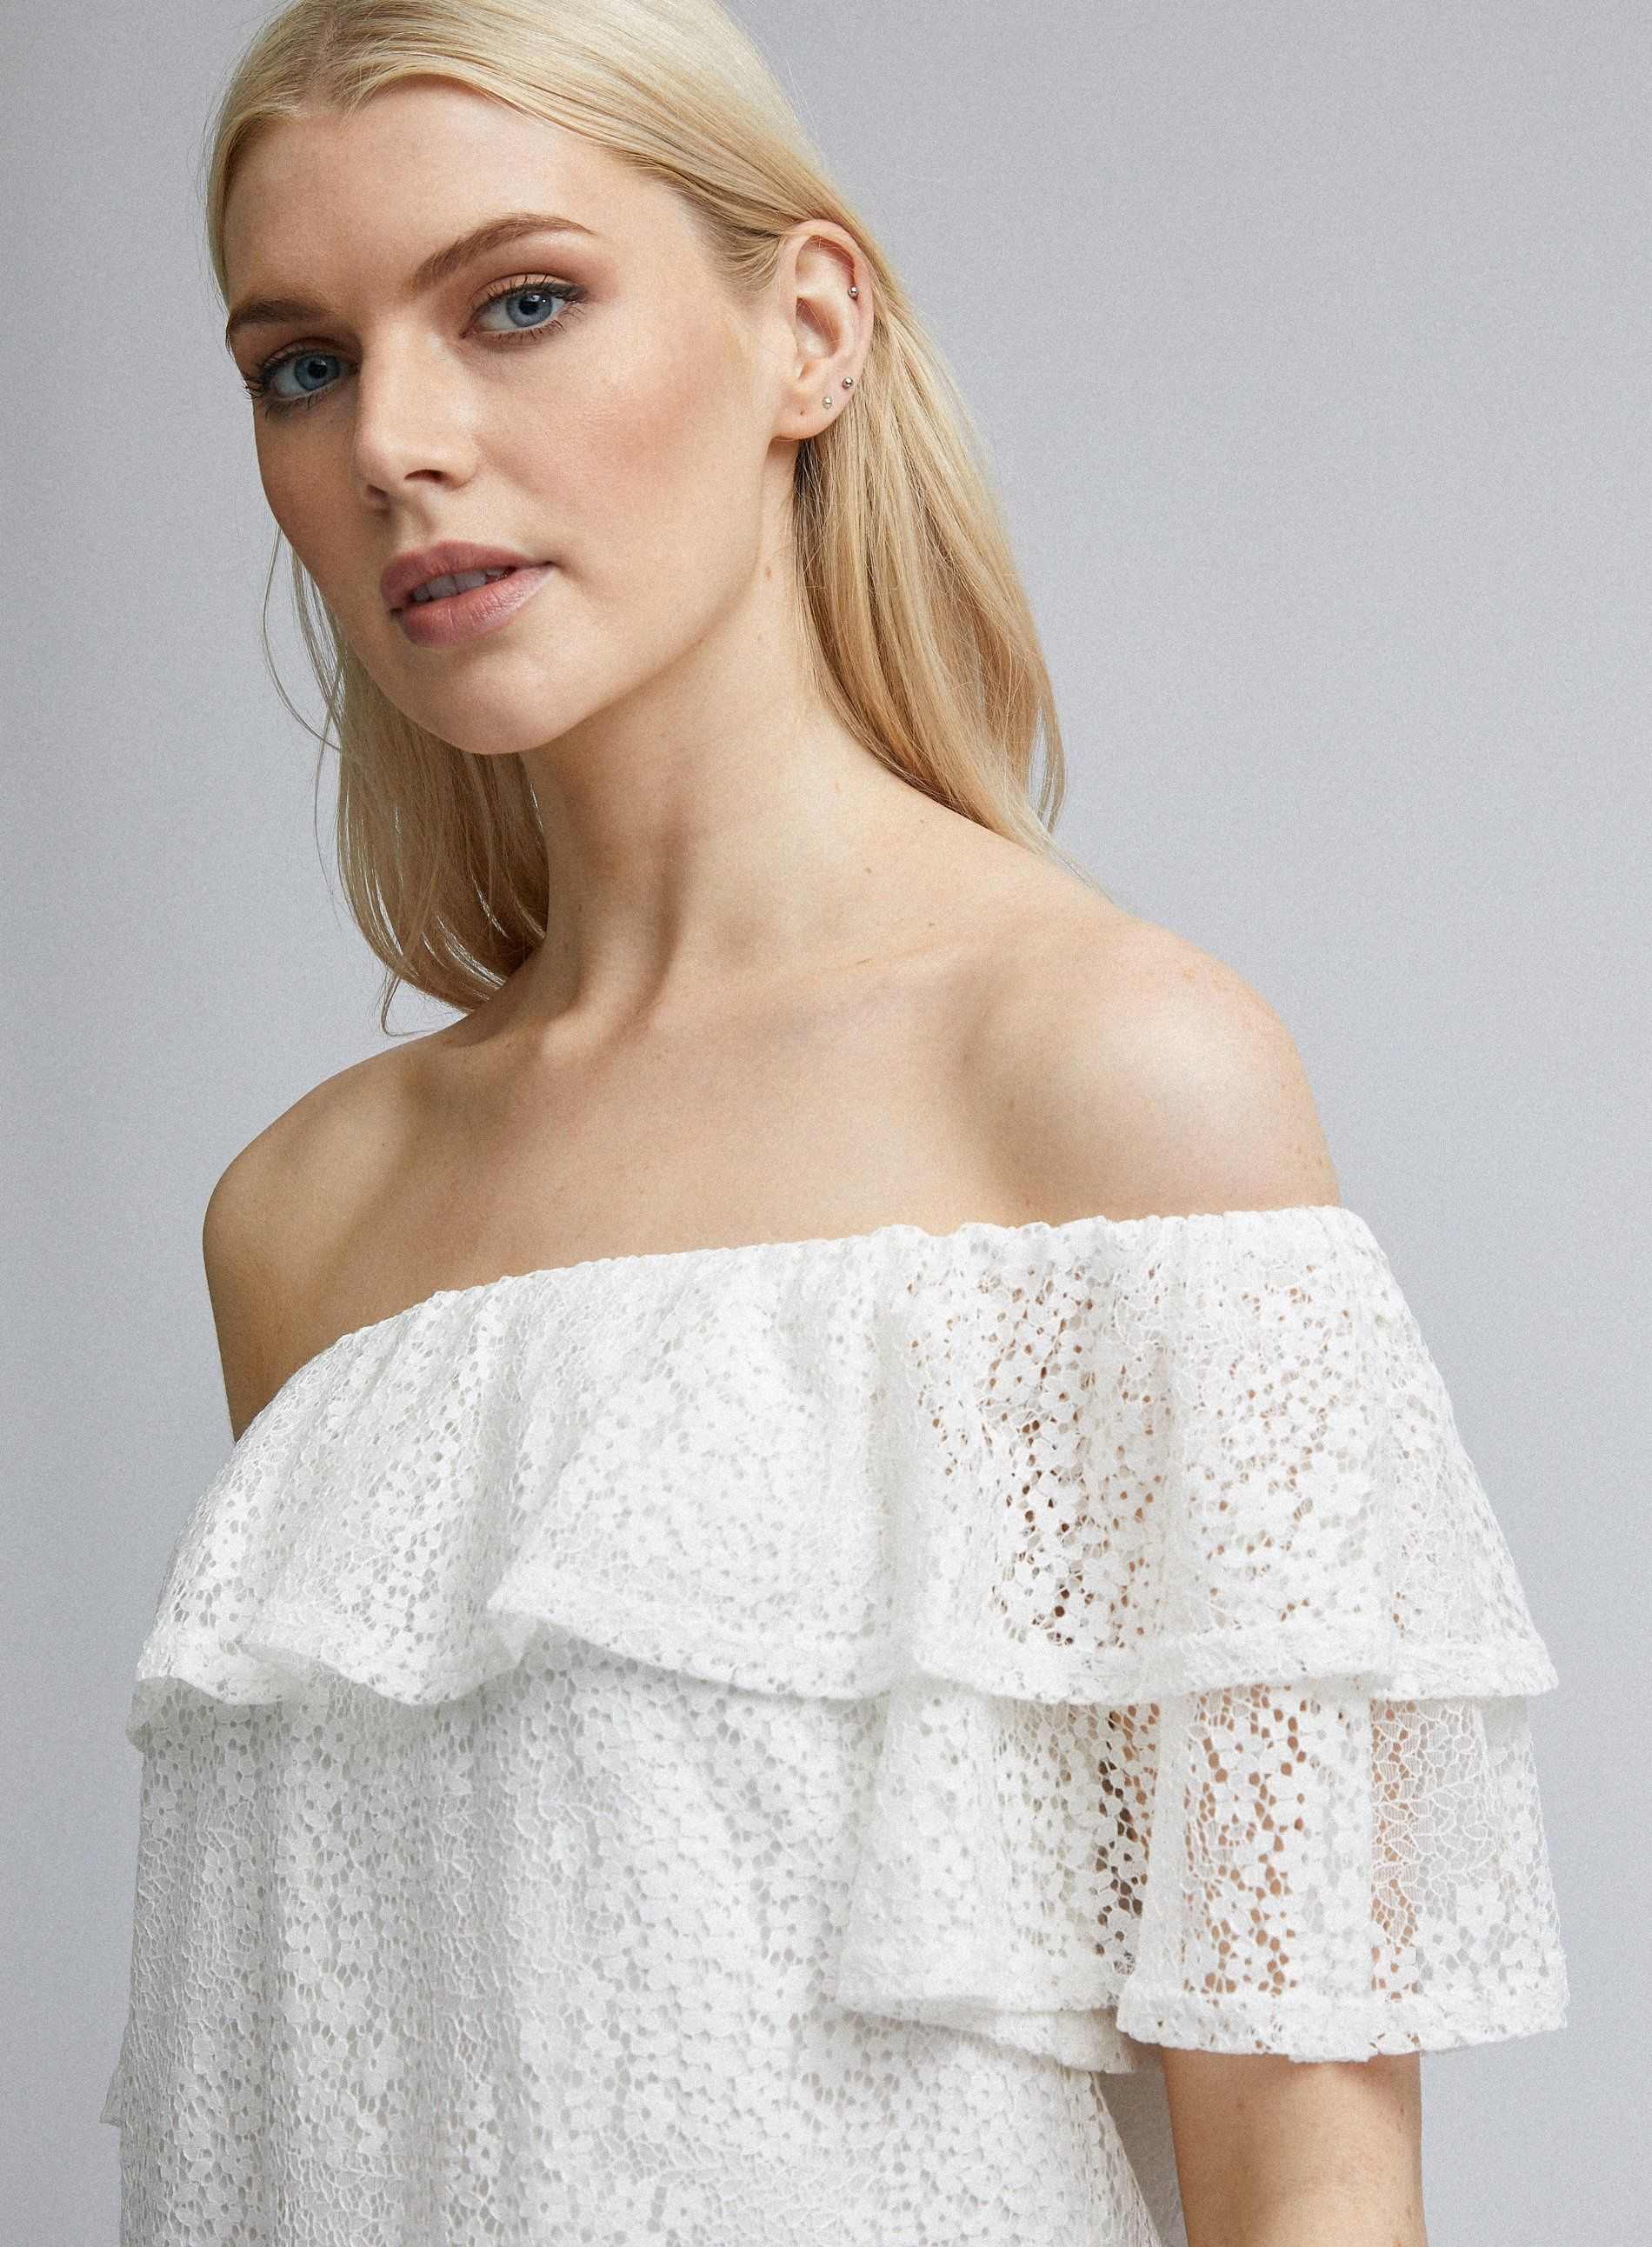 Dorothy Perkins Womens Ivory Ruffle Bardot Top Short Sleeve Shoulderless Blouse